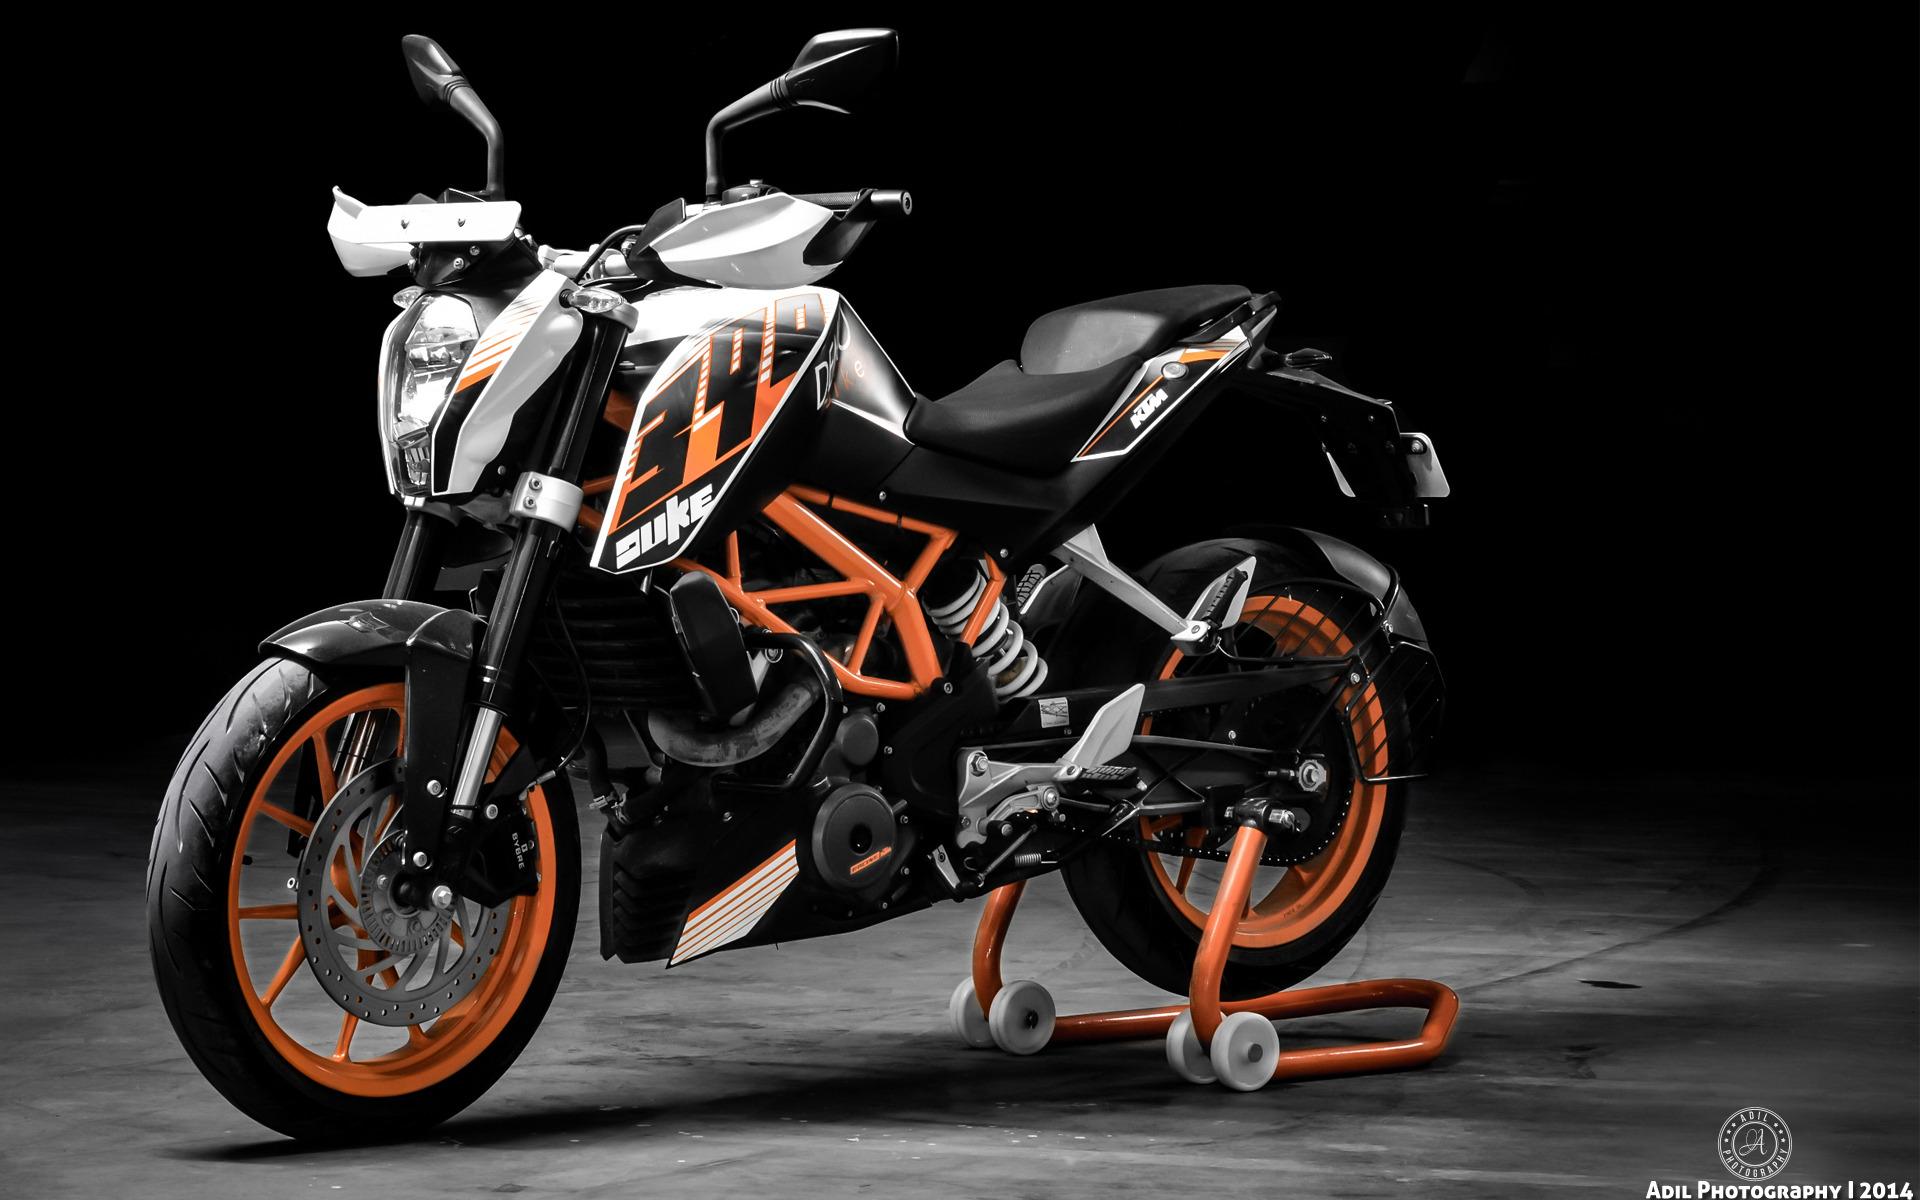 ktm 390 duke motorcycle hd wallpaper 1920x1200 10447 1920x1200